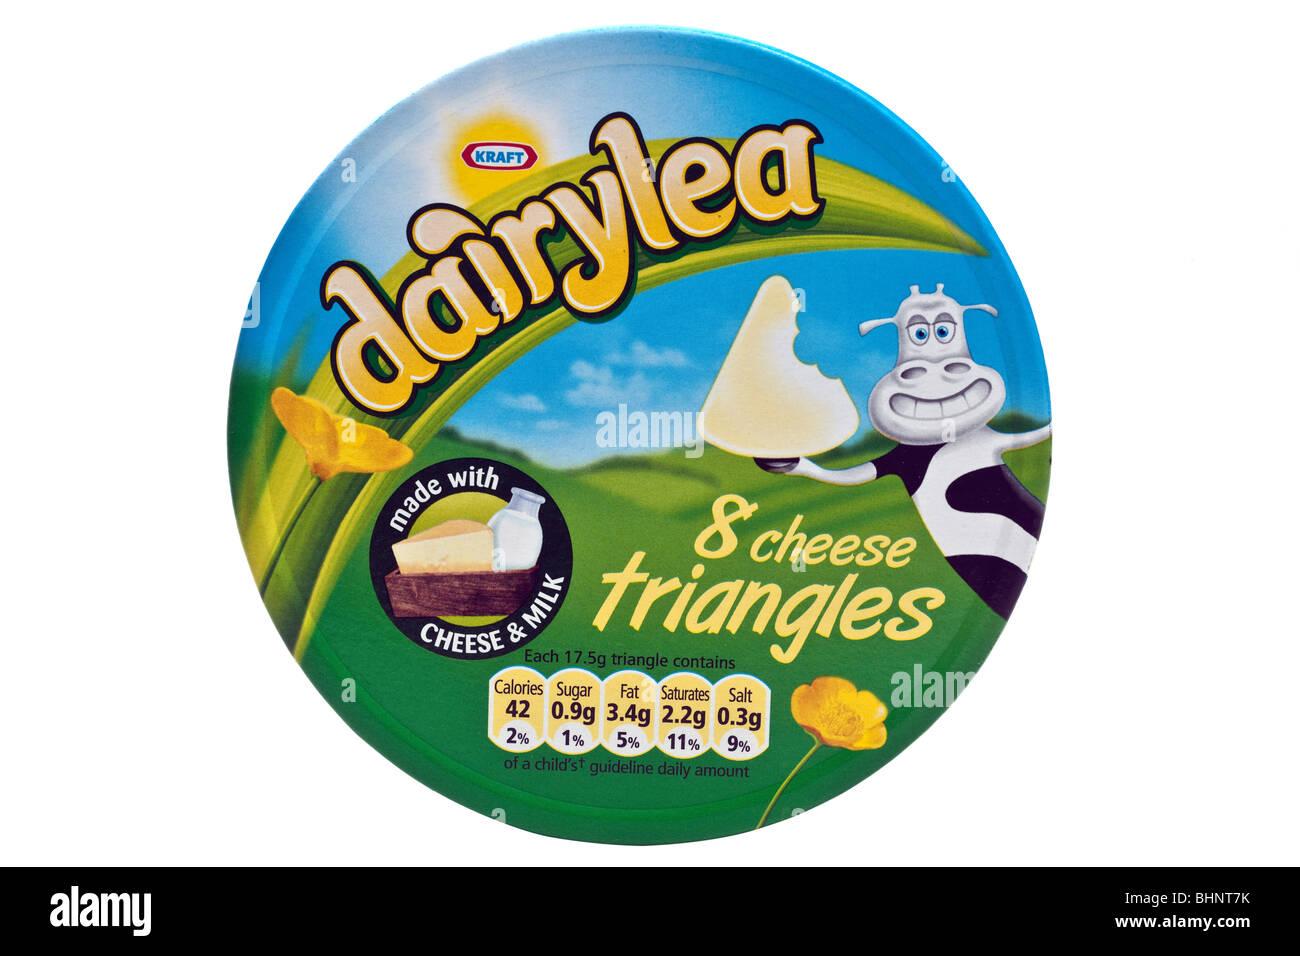 Dairylea 8 soft cream cheese triangles - Stock Image